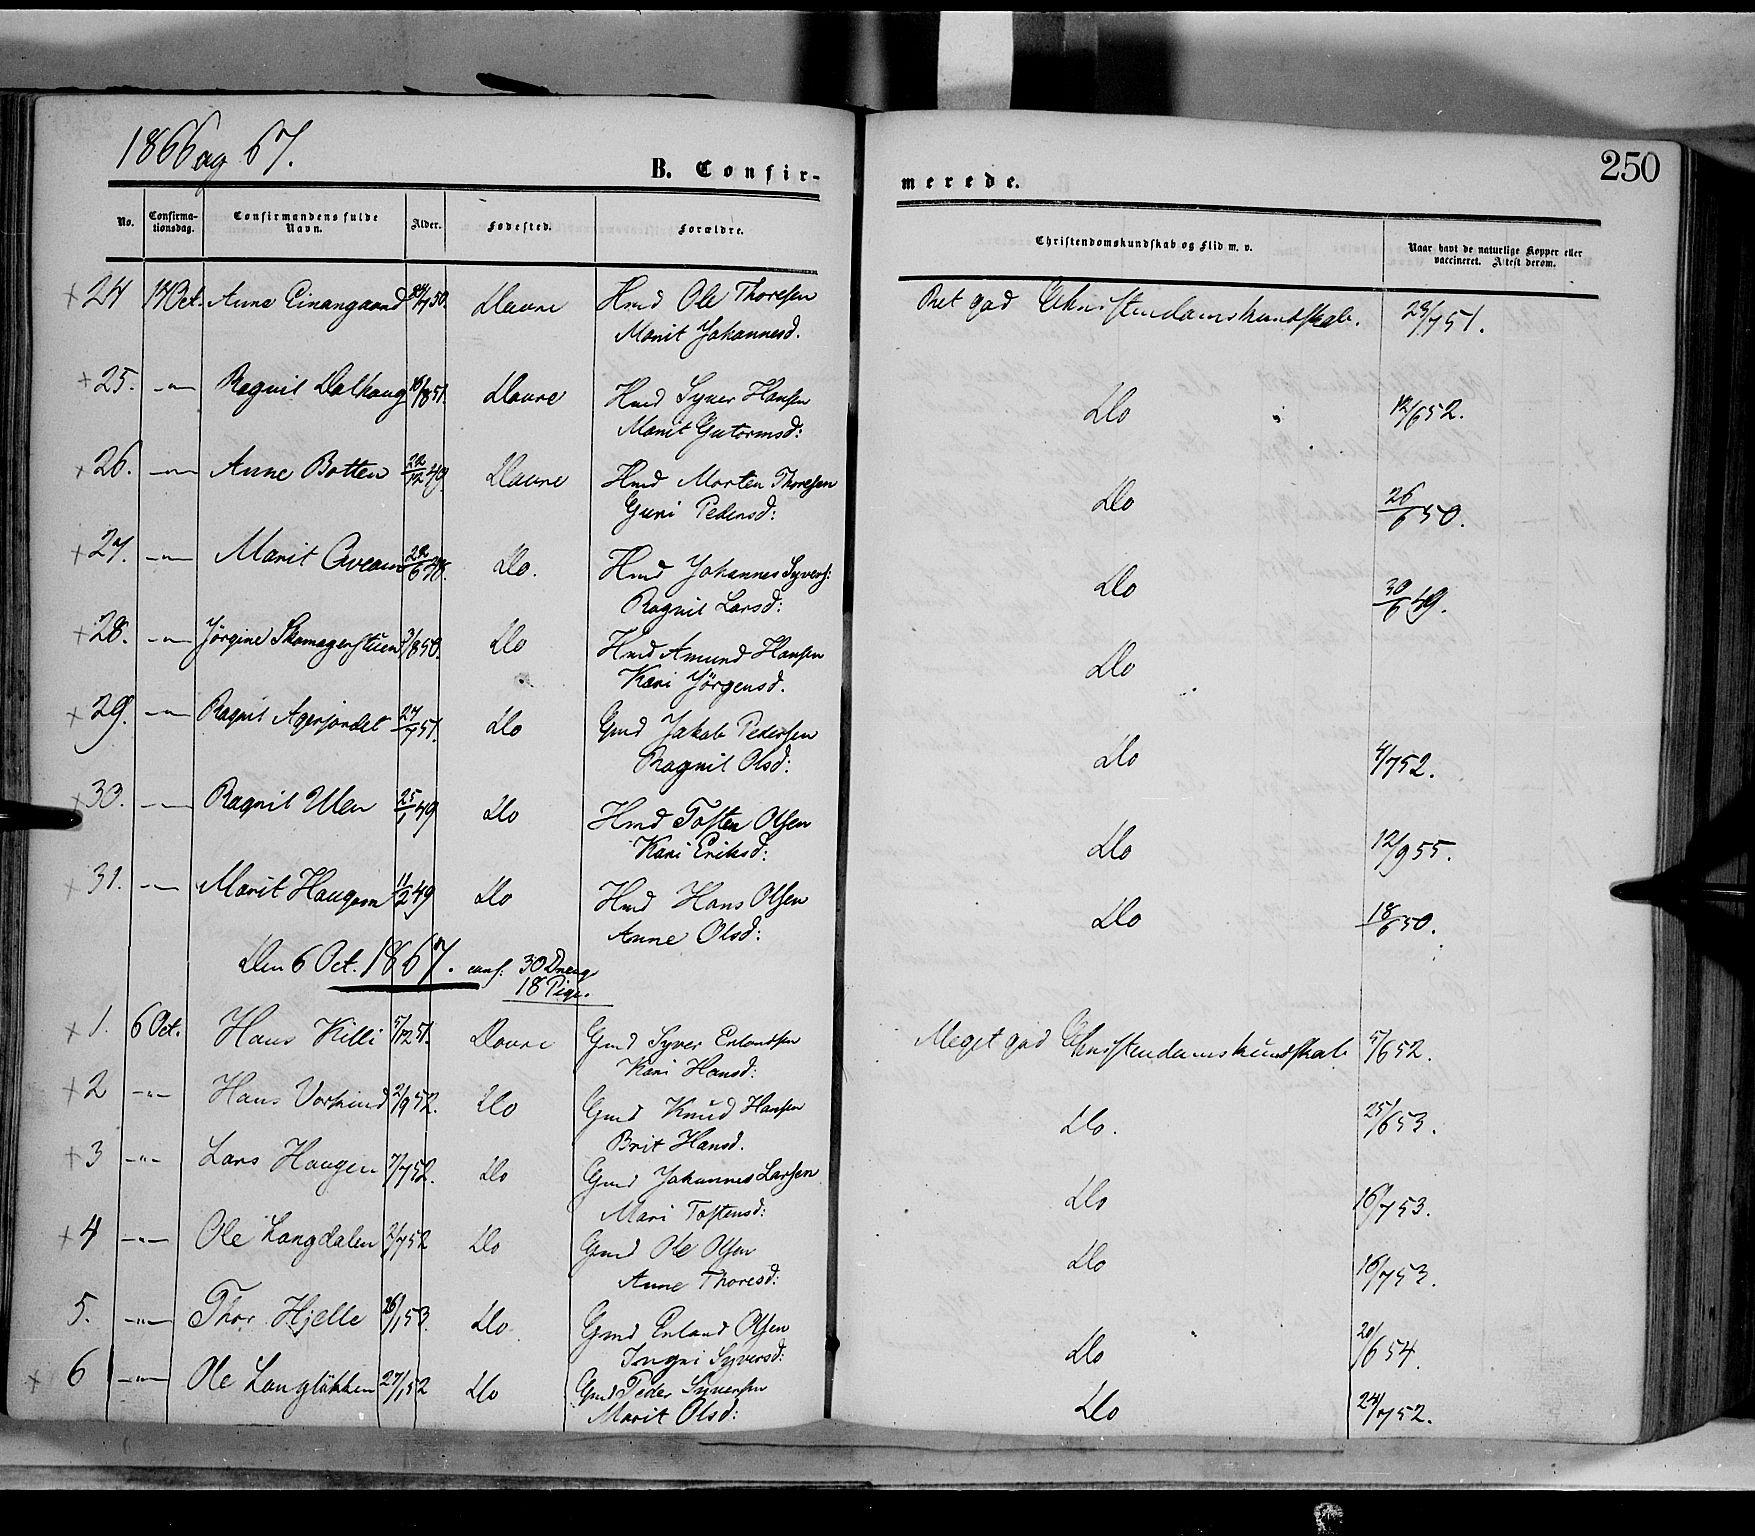 SAH, Dovre prestekontor, Ministerialbok nr. 1, 1854-1878, s. 250